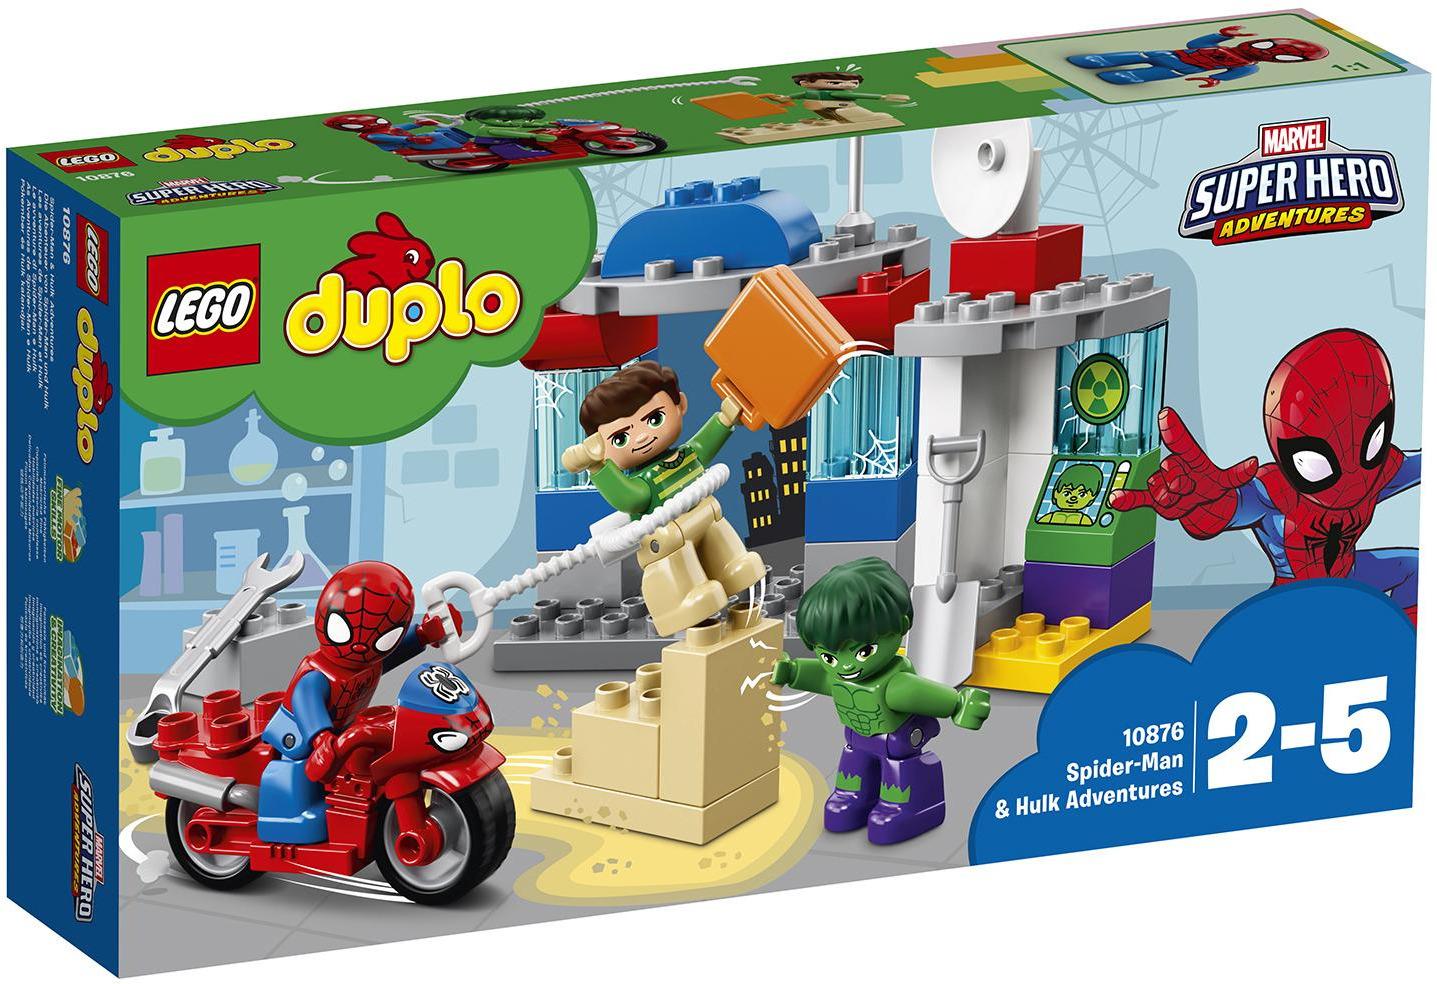 LEGO DUPLO Super Heroes Marvel 10876 Приключения Человека-паука и Халка Конструктор lego конструктор джуниорс убежище человека паука